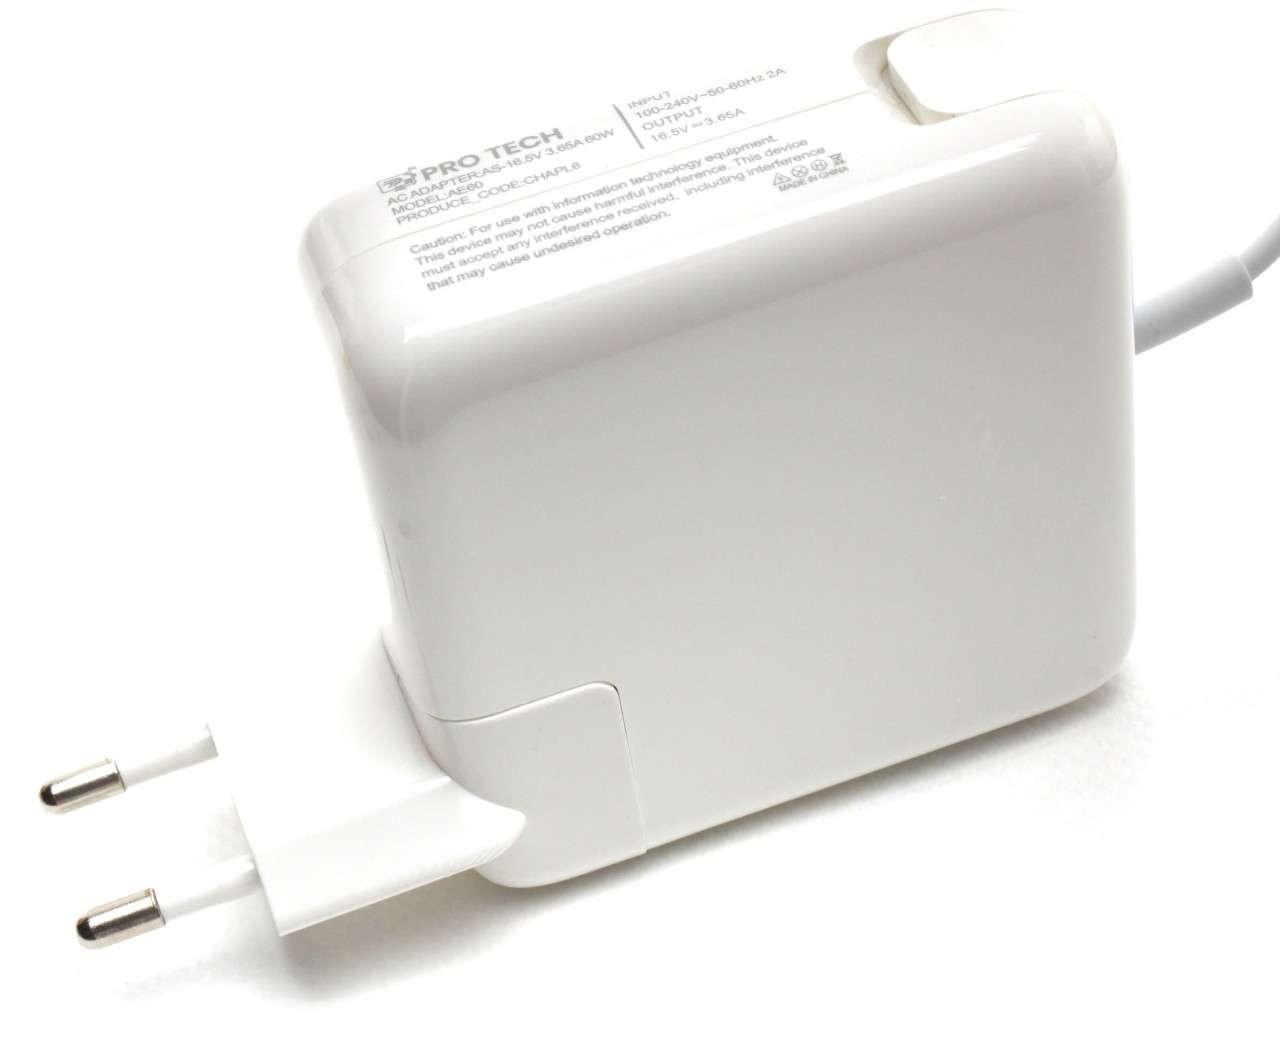 Incarcator Apple MacBook A1181 Replacement imagine powerlaptop.ro 2021